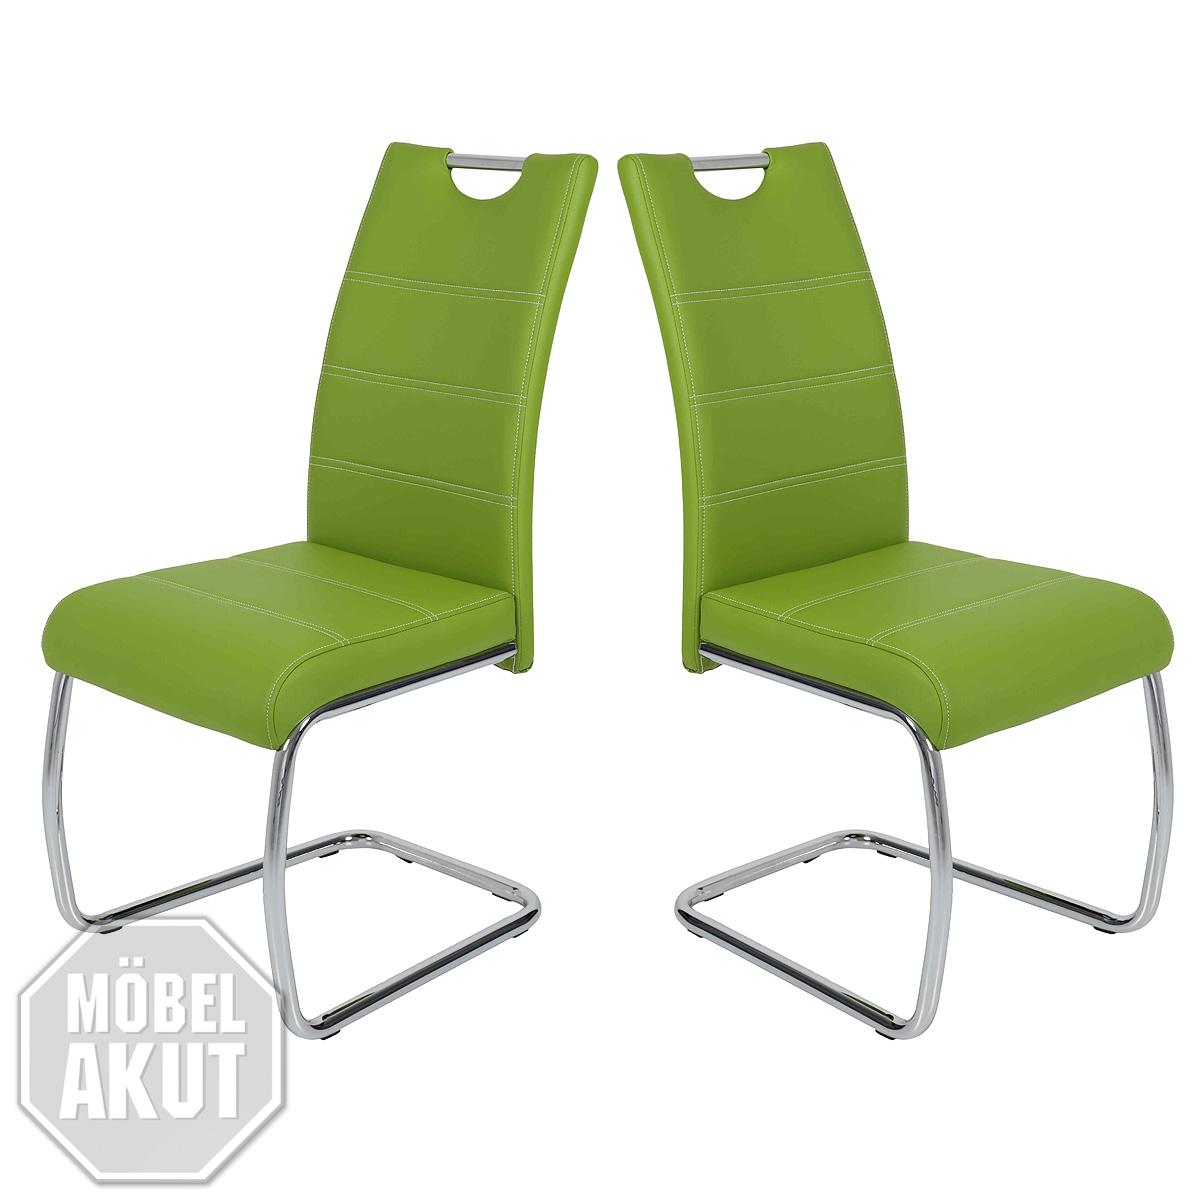 schwingstuhl flora 4er set stuhl esszimmerstuhl in gr n naht wei und chrom ebay. Black Bedroom Furniture Sets. Home Design Ideas